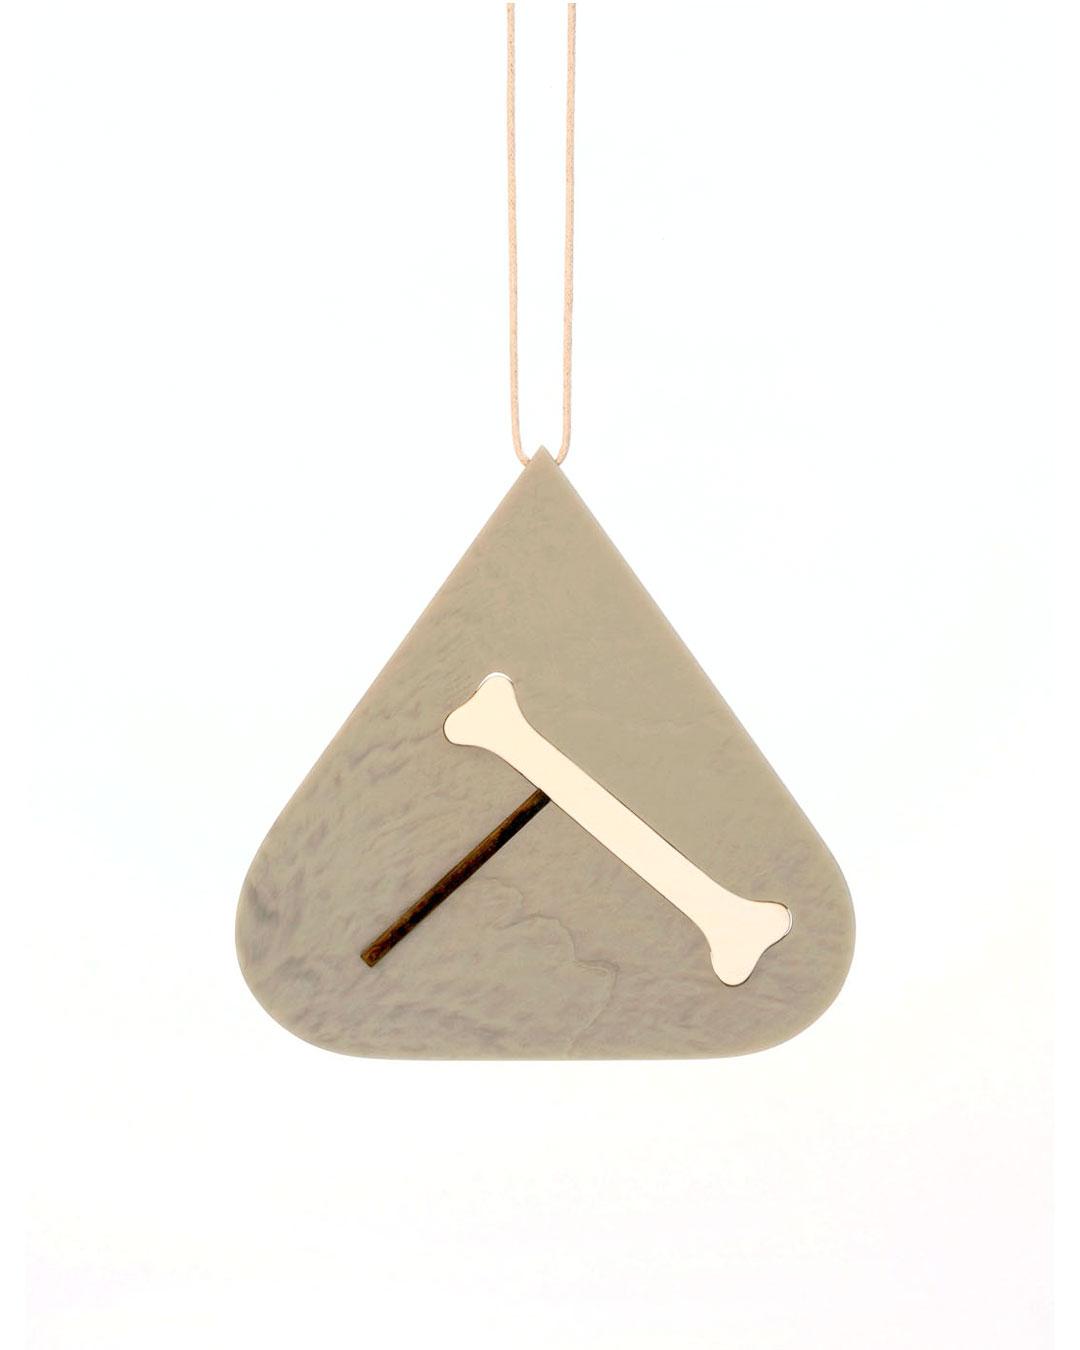 Julia Walter, Balance, 2014, necklace; Galalith, oak, cotton string, 130 x 130 x 5 mm, €1980